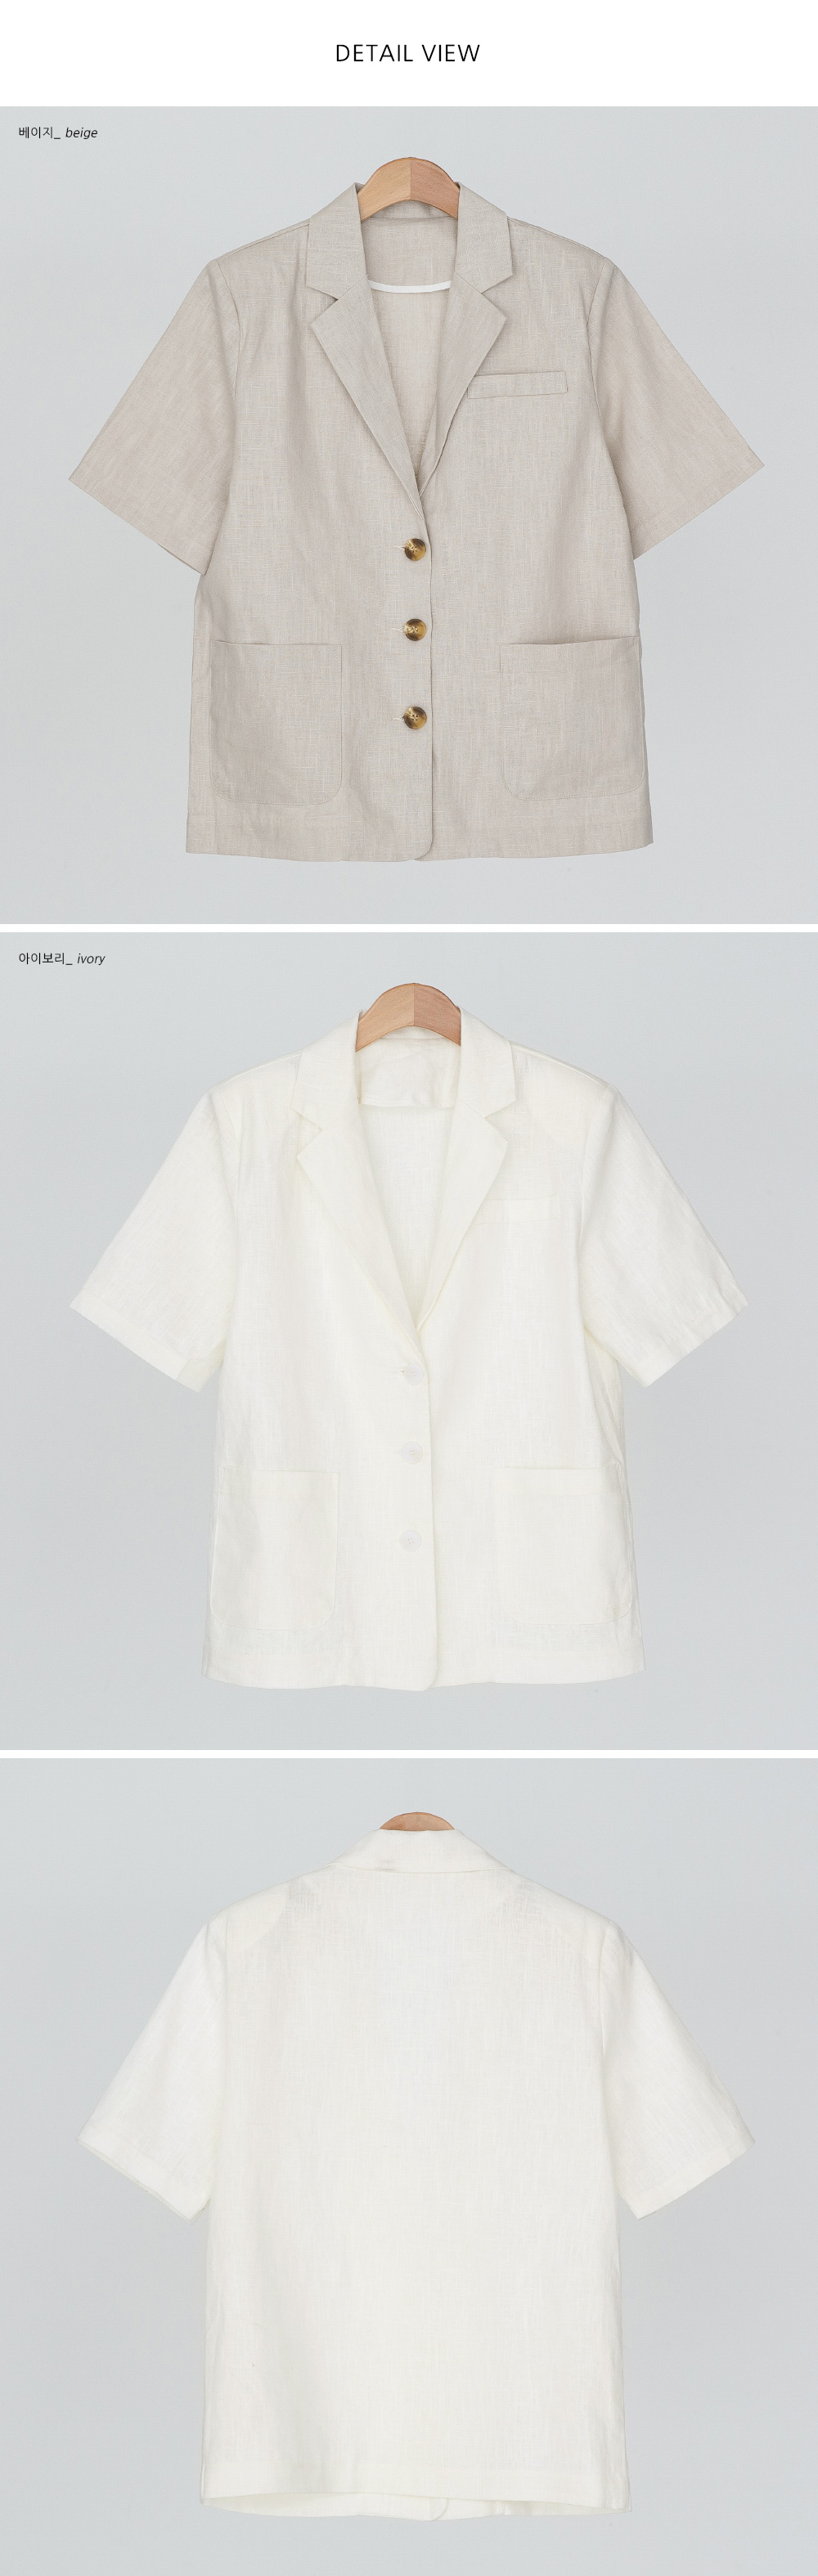 Loose-Fit Five-Sleeve Linen Jacket